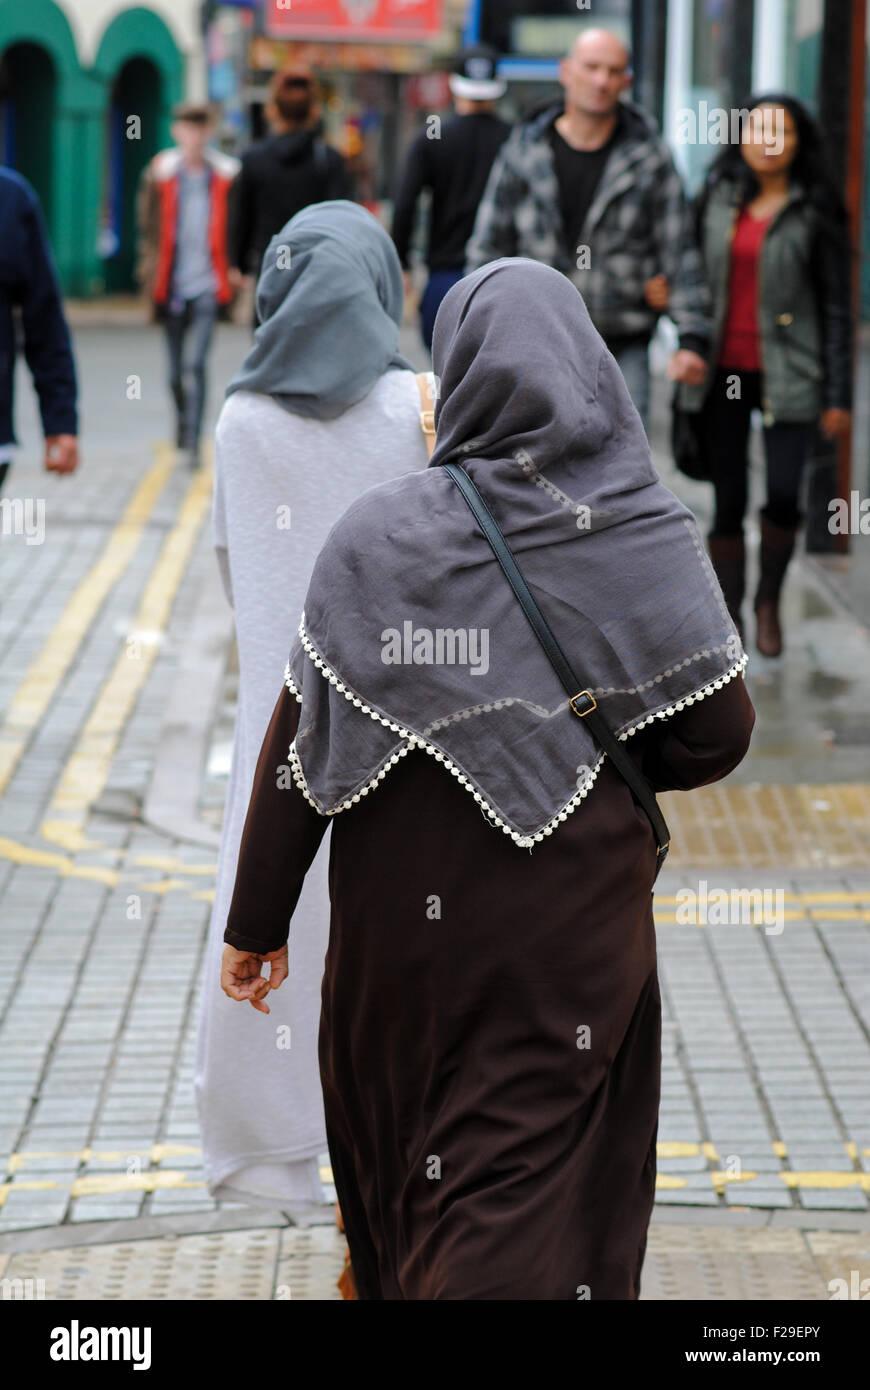 Two Muslim women wearing hijab in England UK - Stock Image